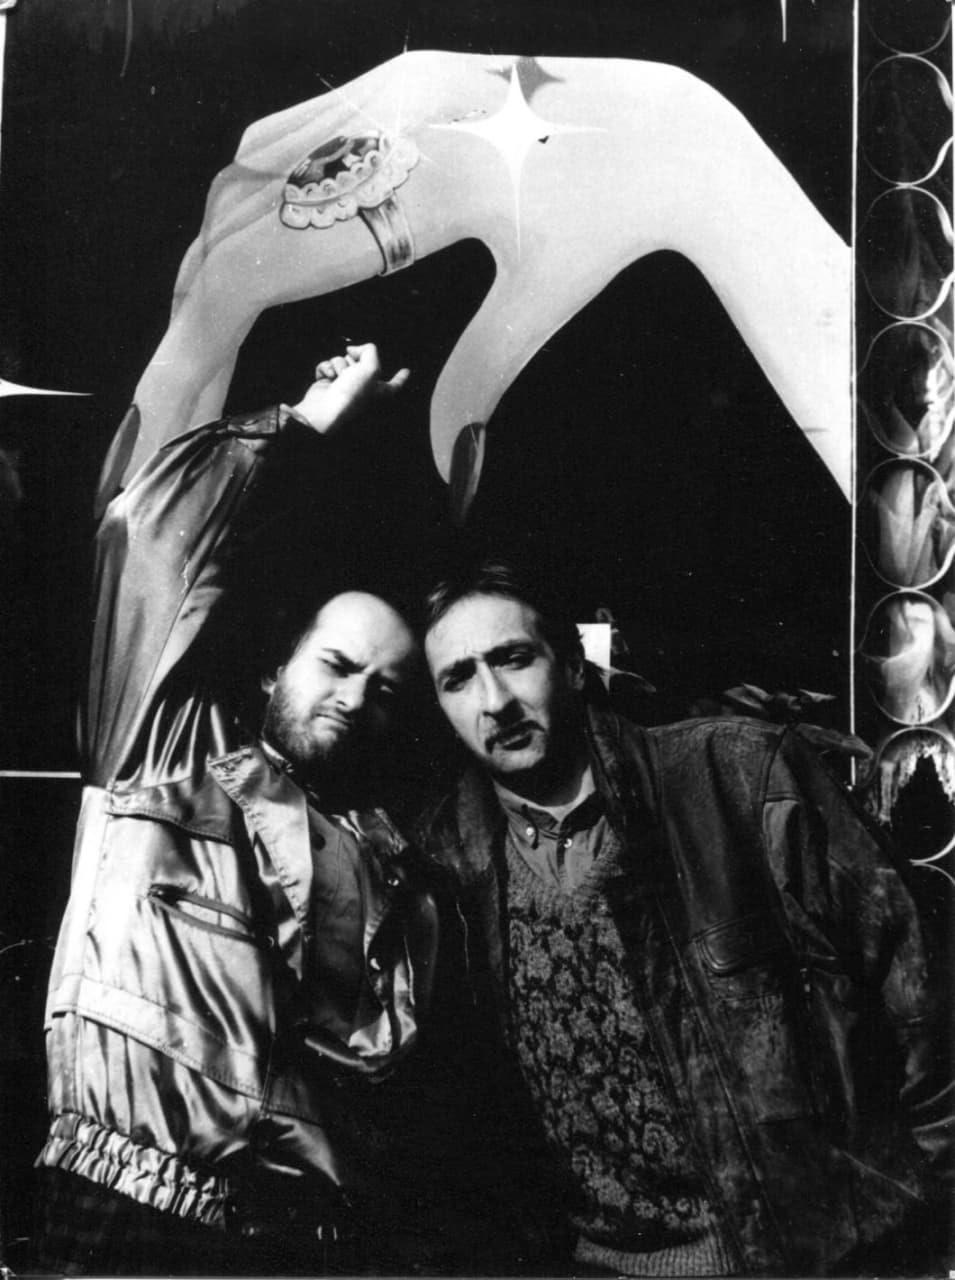 Фланери. Олександр Ройтбурд, Леонід Войцехов. Фото Олександра Шевчука, 1987